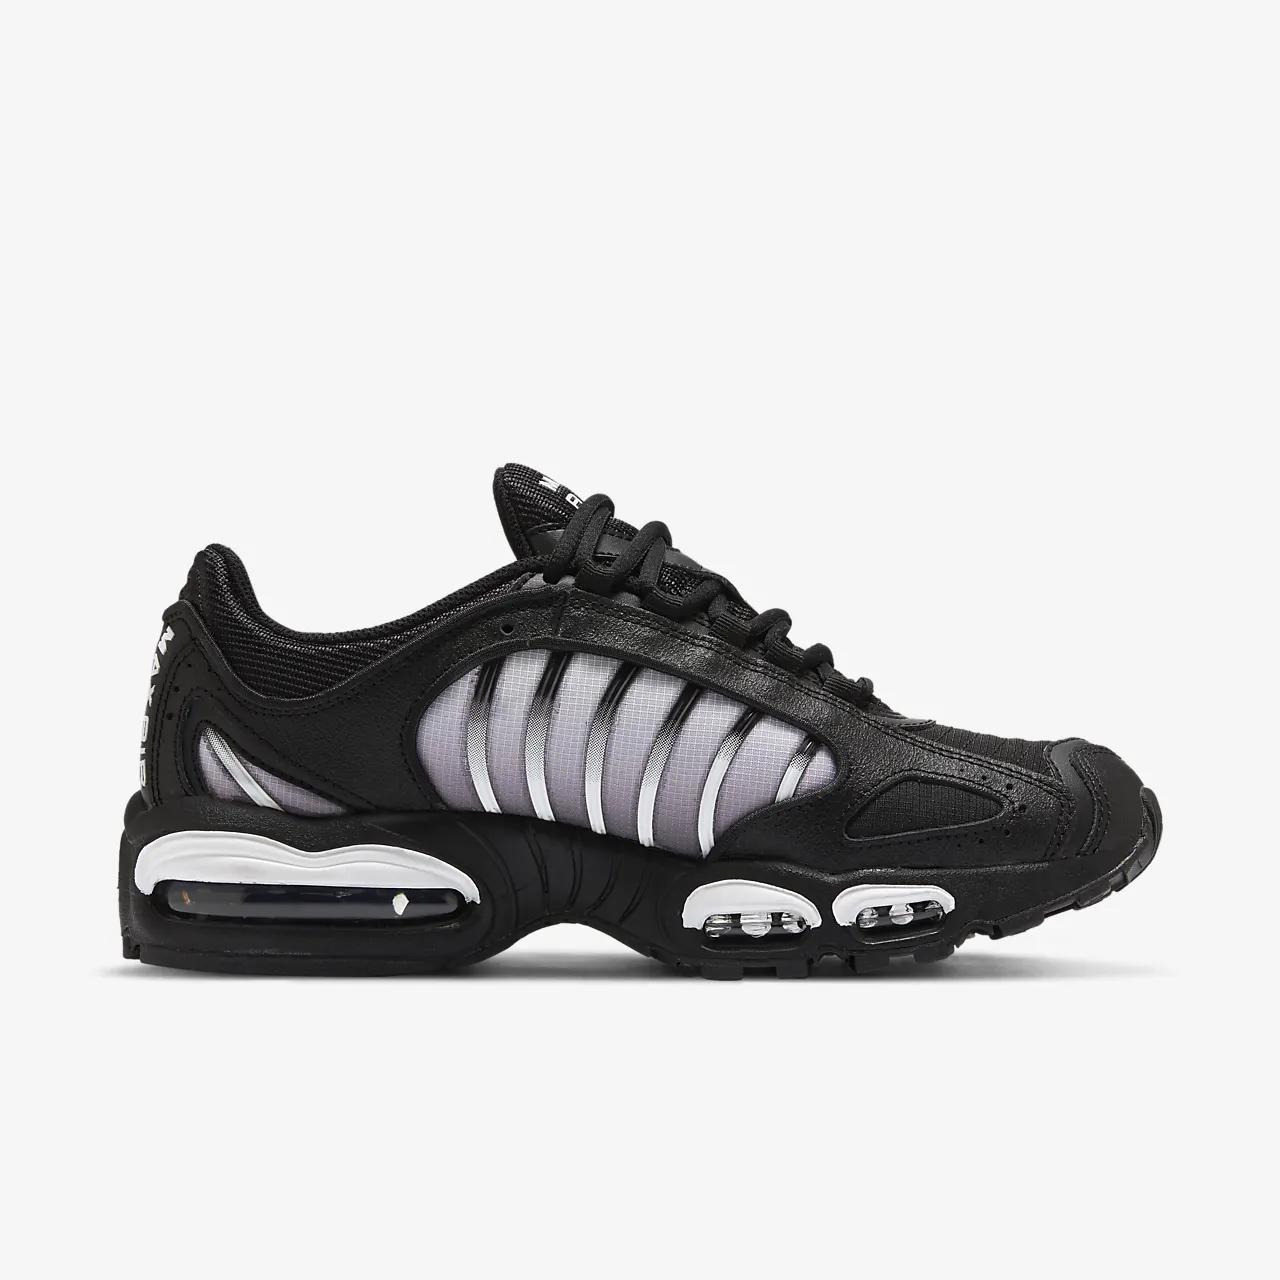 Nike Air Max Tailwind IV Men's Shoe AQ2567-004